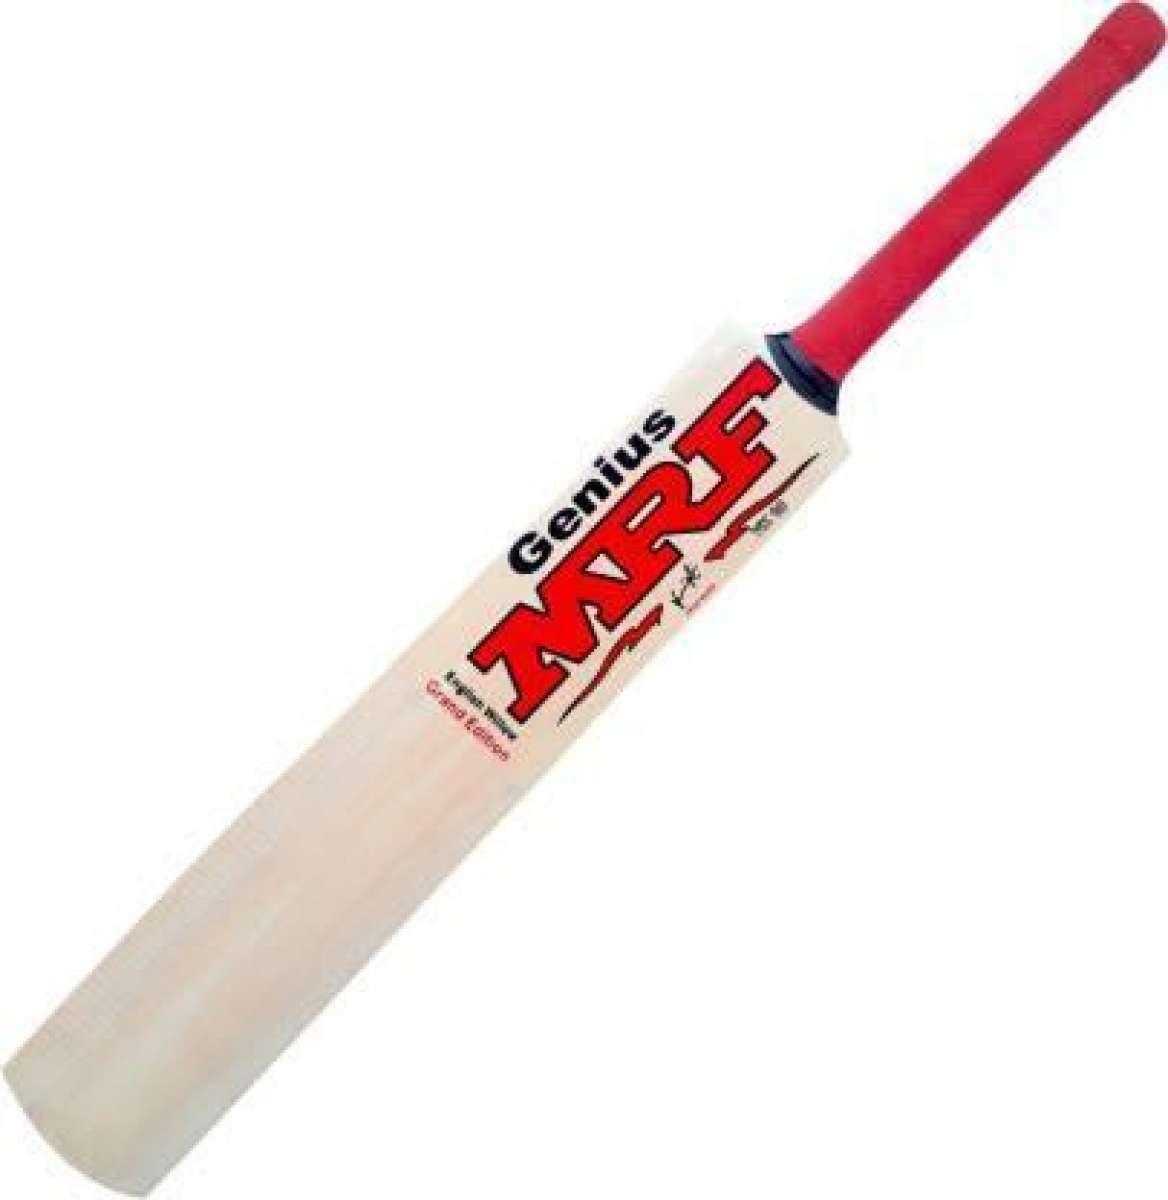 MRF VIRAT Tape Ball Cricket Bat(From Sialkot Punjab)